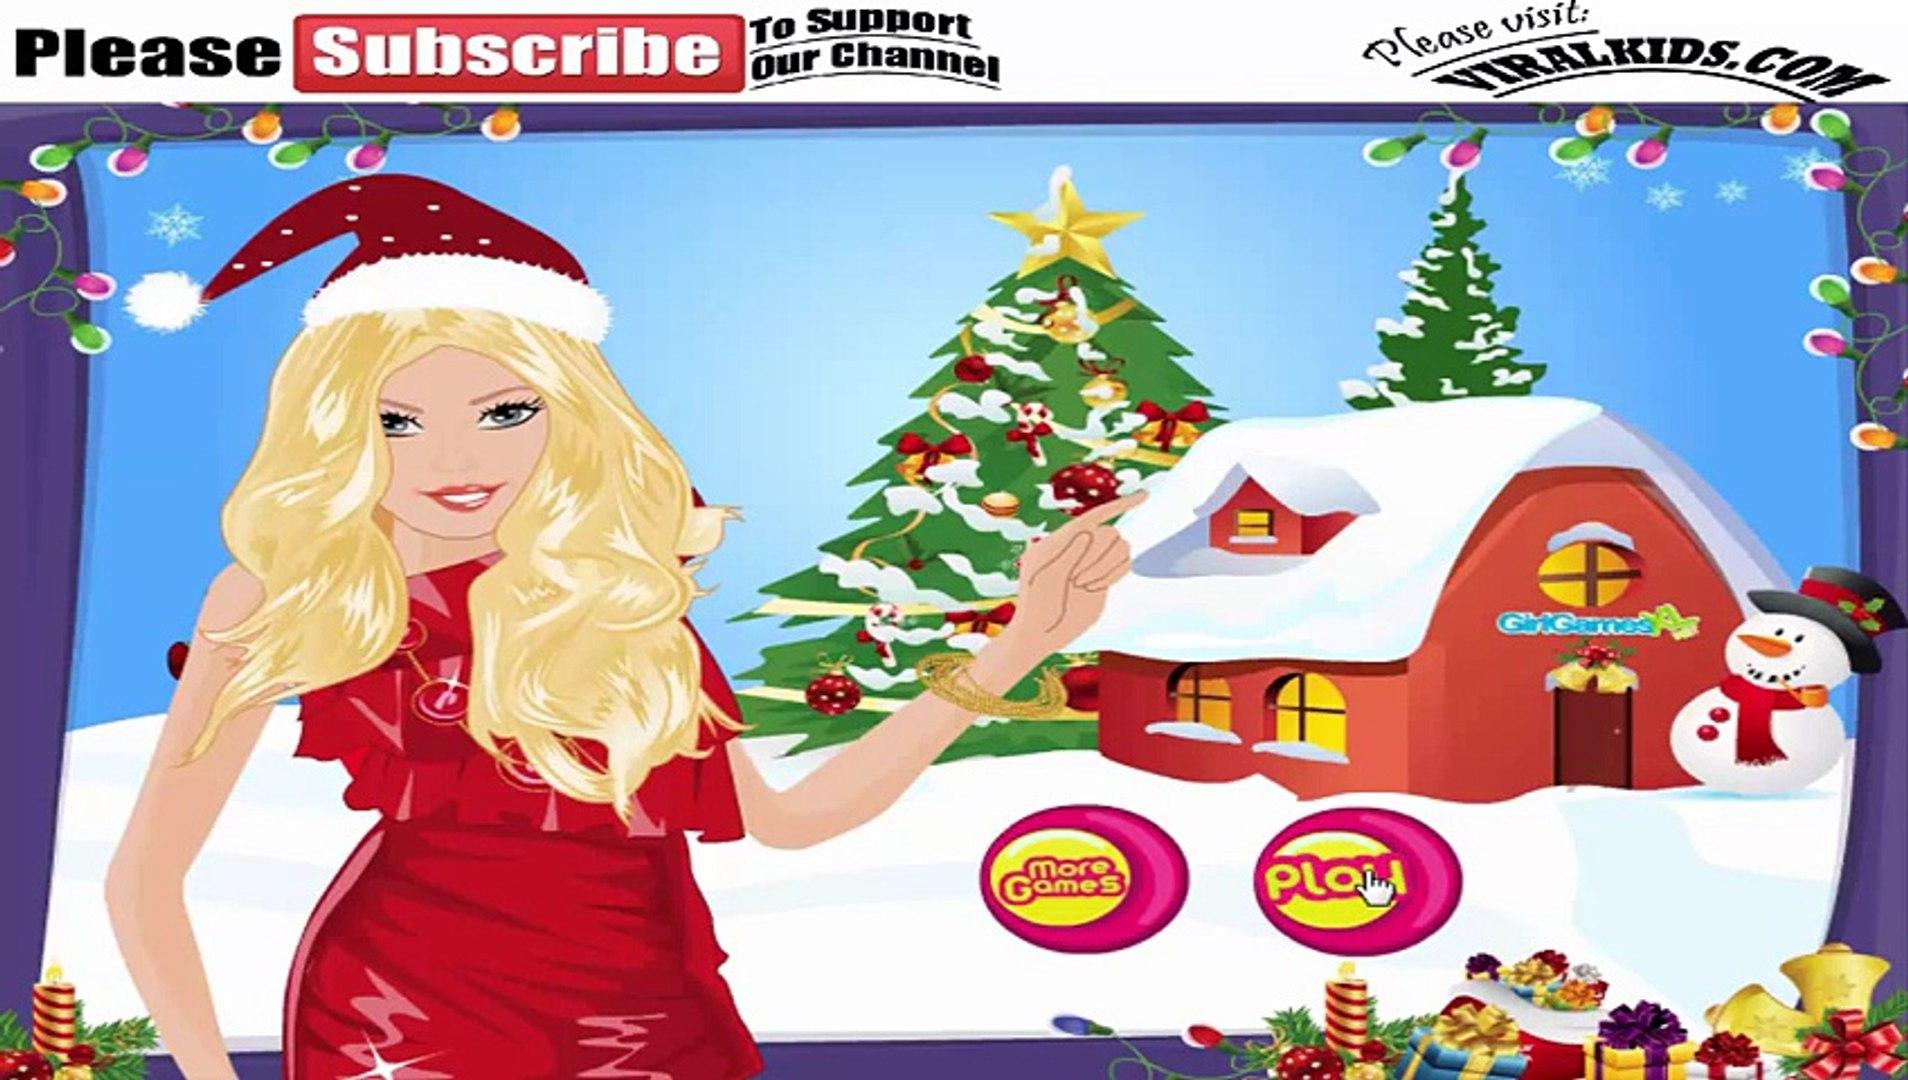 Barbie Games - Barbie Christmas Party Preparation - Play Free Barbie Girls